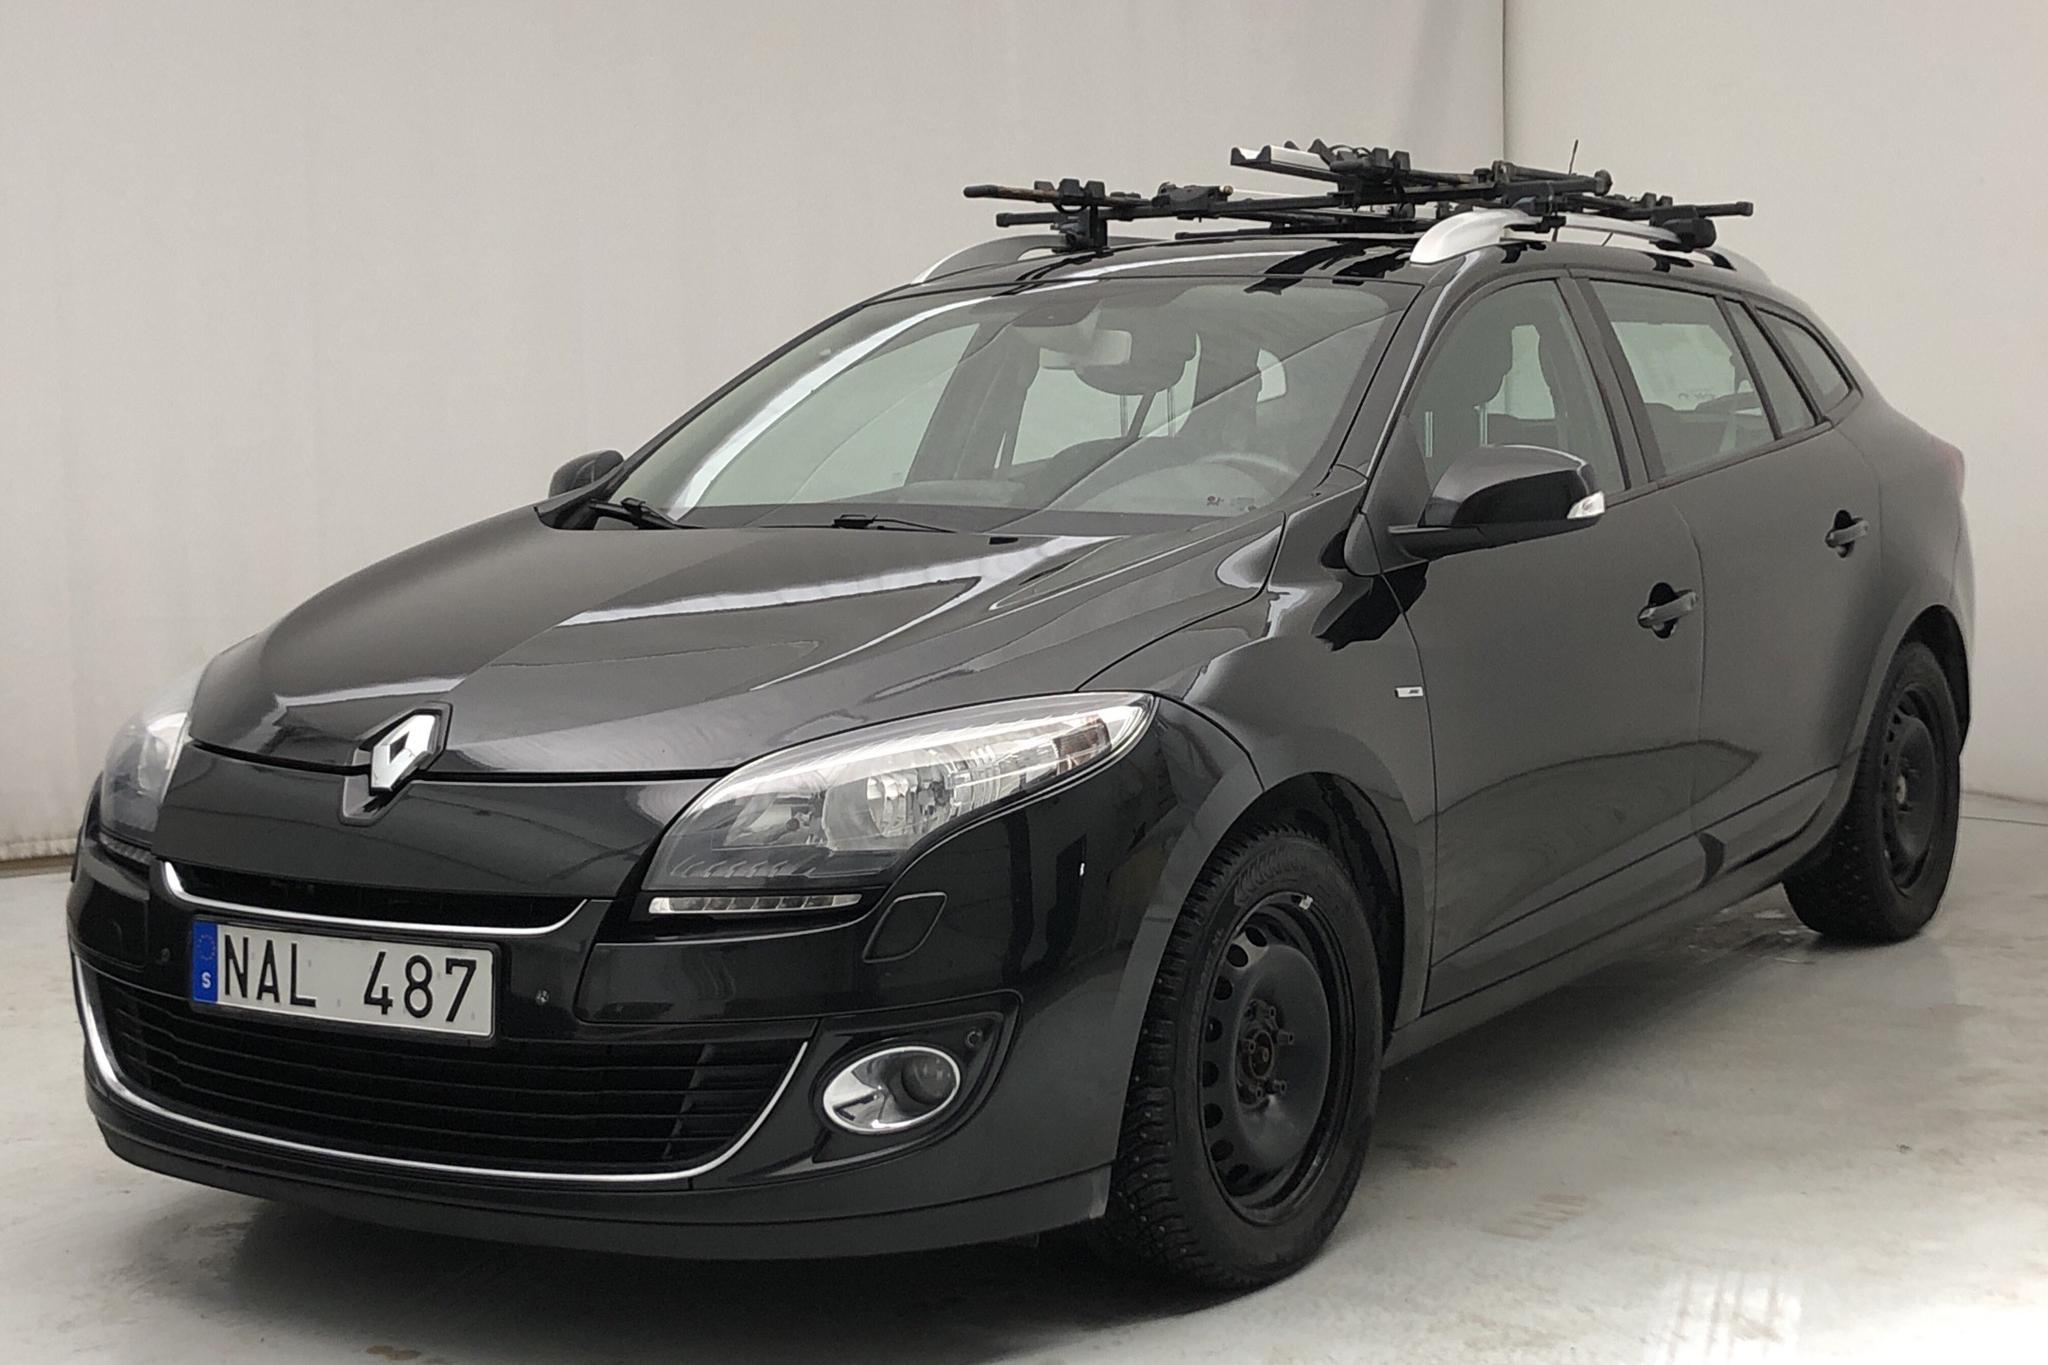 Renault Mégane Phas III 1.6 dCi Sports Tourer (130hk) - 17 184 mil - Manuell - svart - 2013